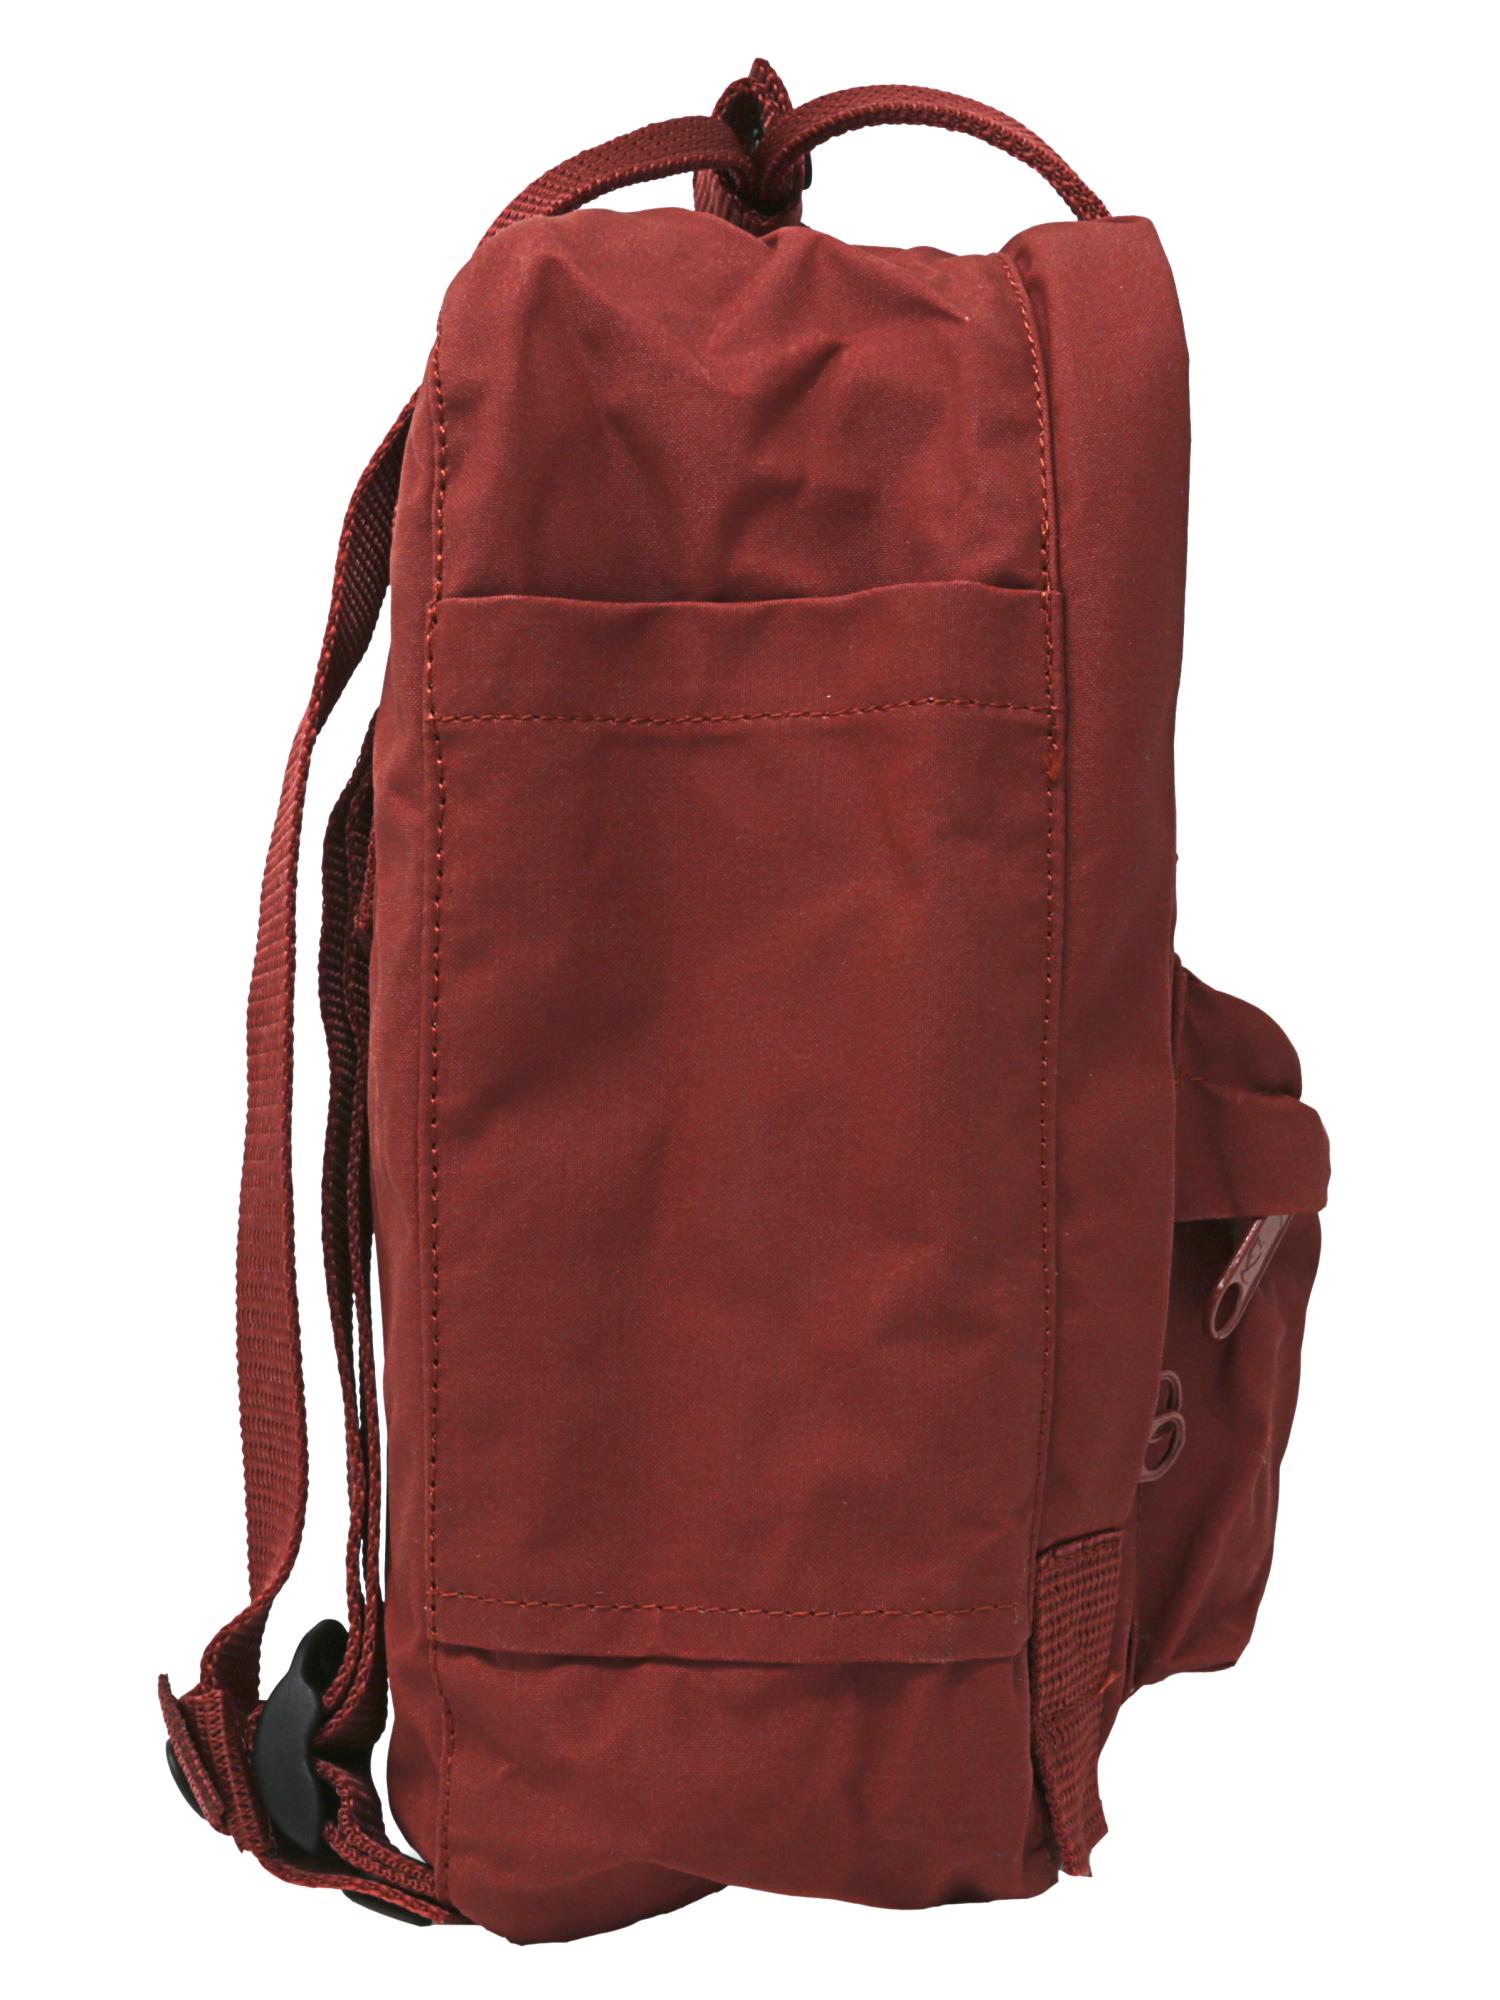 ff14dd5ad9cf Fjallraven Kanken Mini Daypack Polyester Backpack